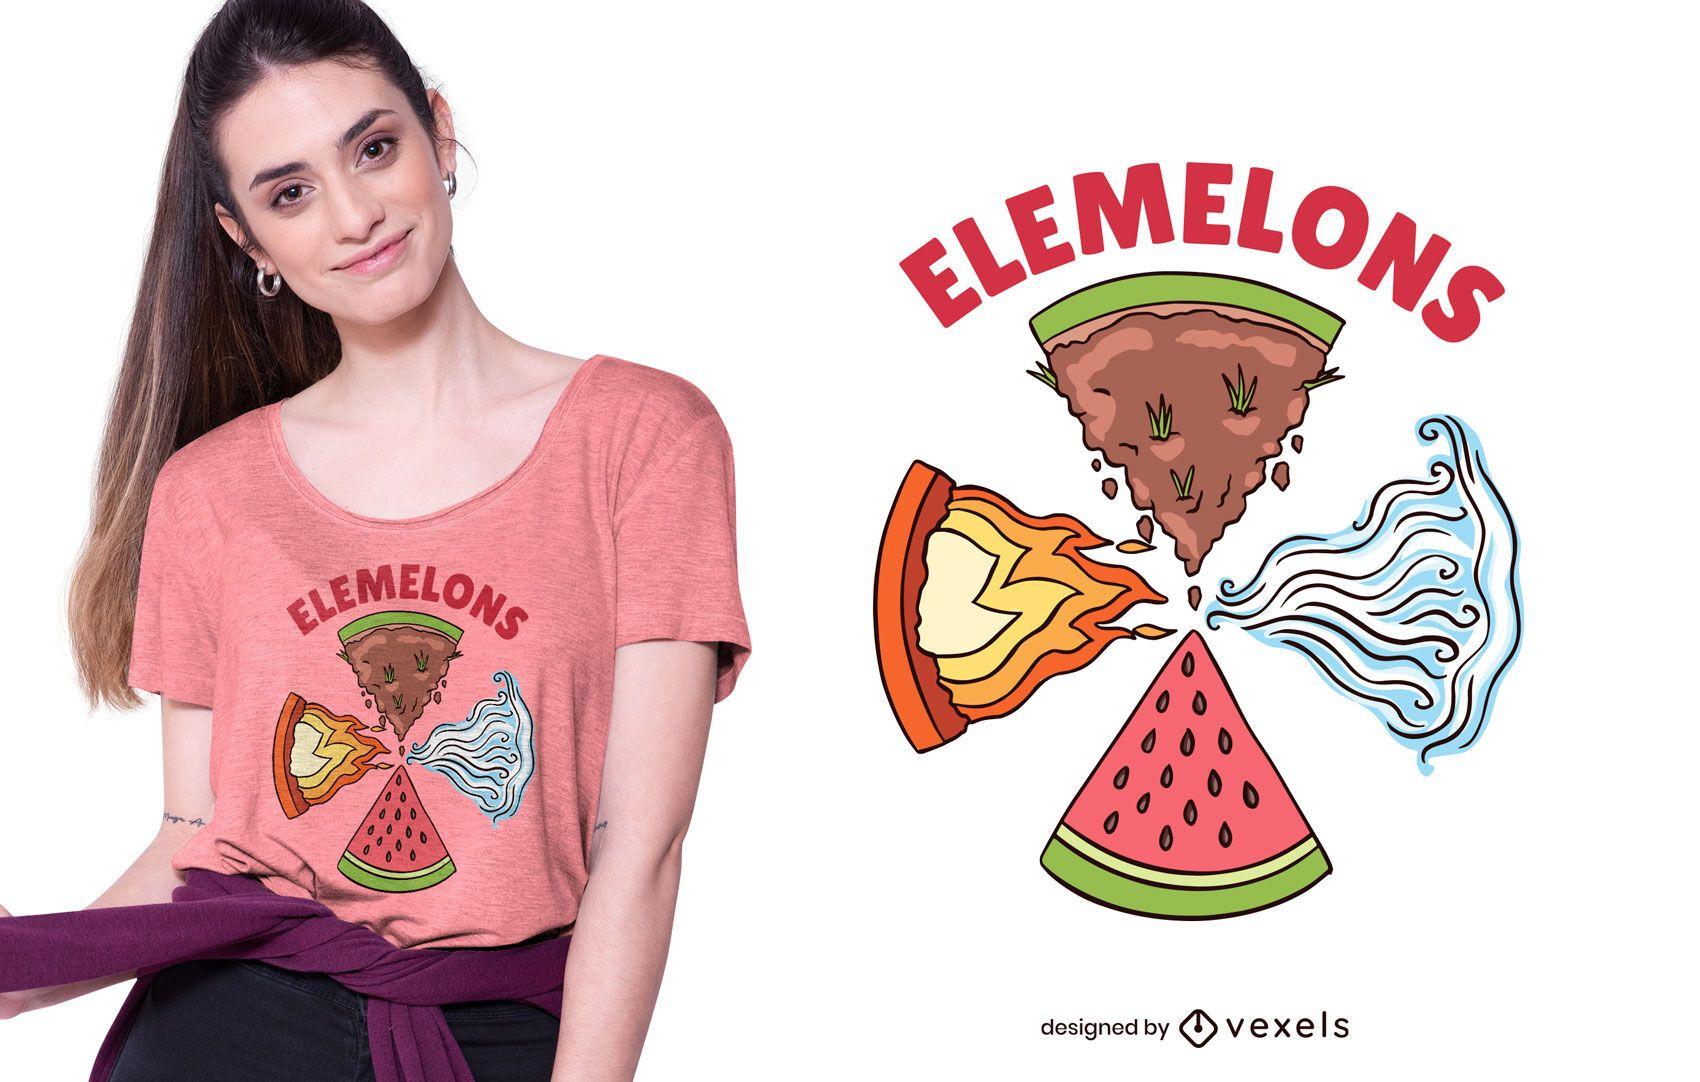 Watermelon elements t-shirt design